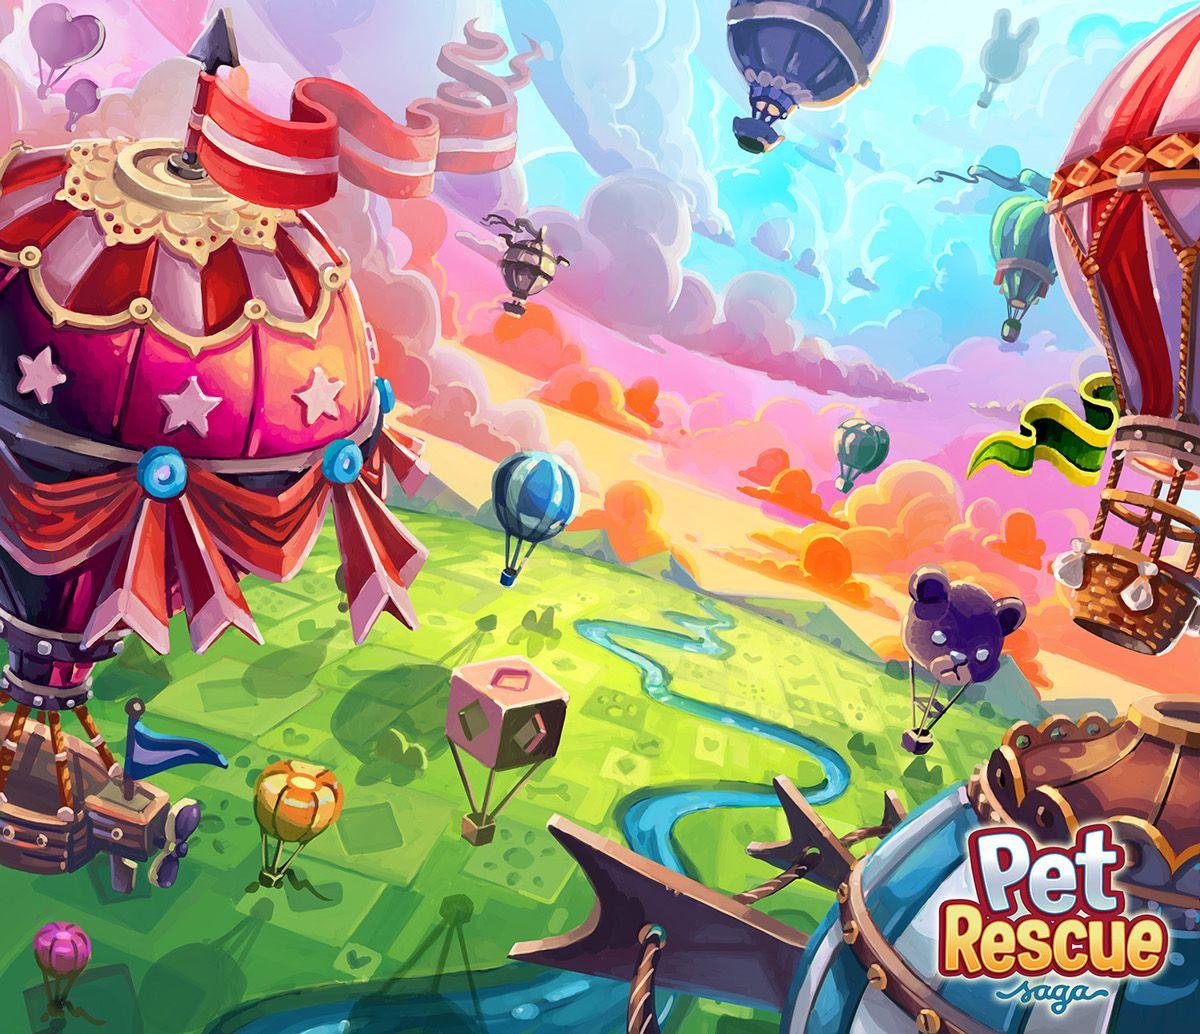 Pet Rescue Saga Background Art On Behance Pet Rescue Saga Art